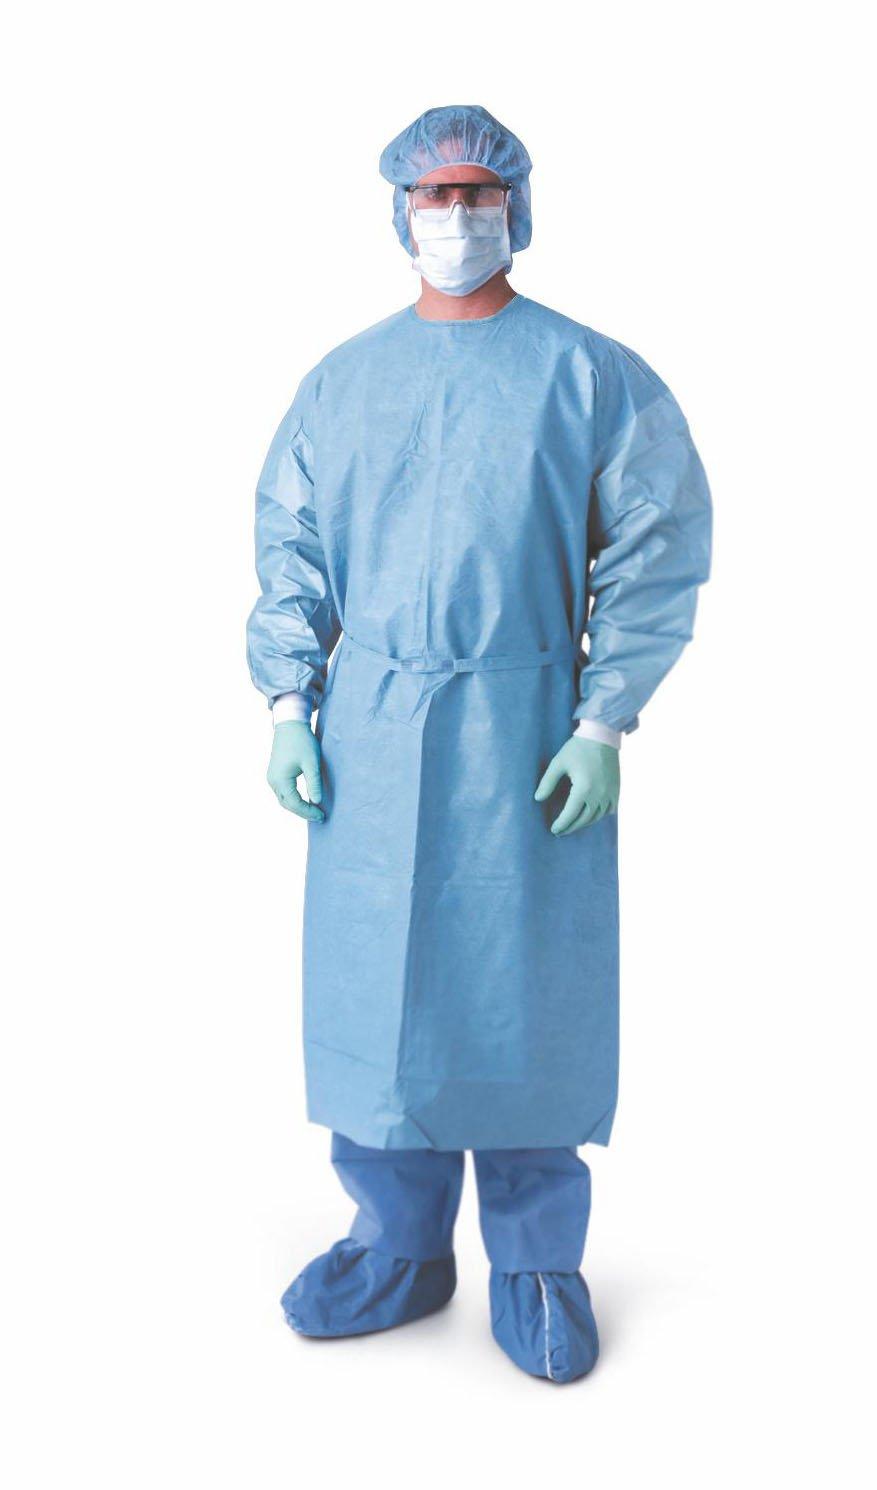 Amazon.com: Medline NON27457 Prevention Plus Isolation Gowns, R ...